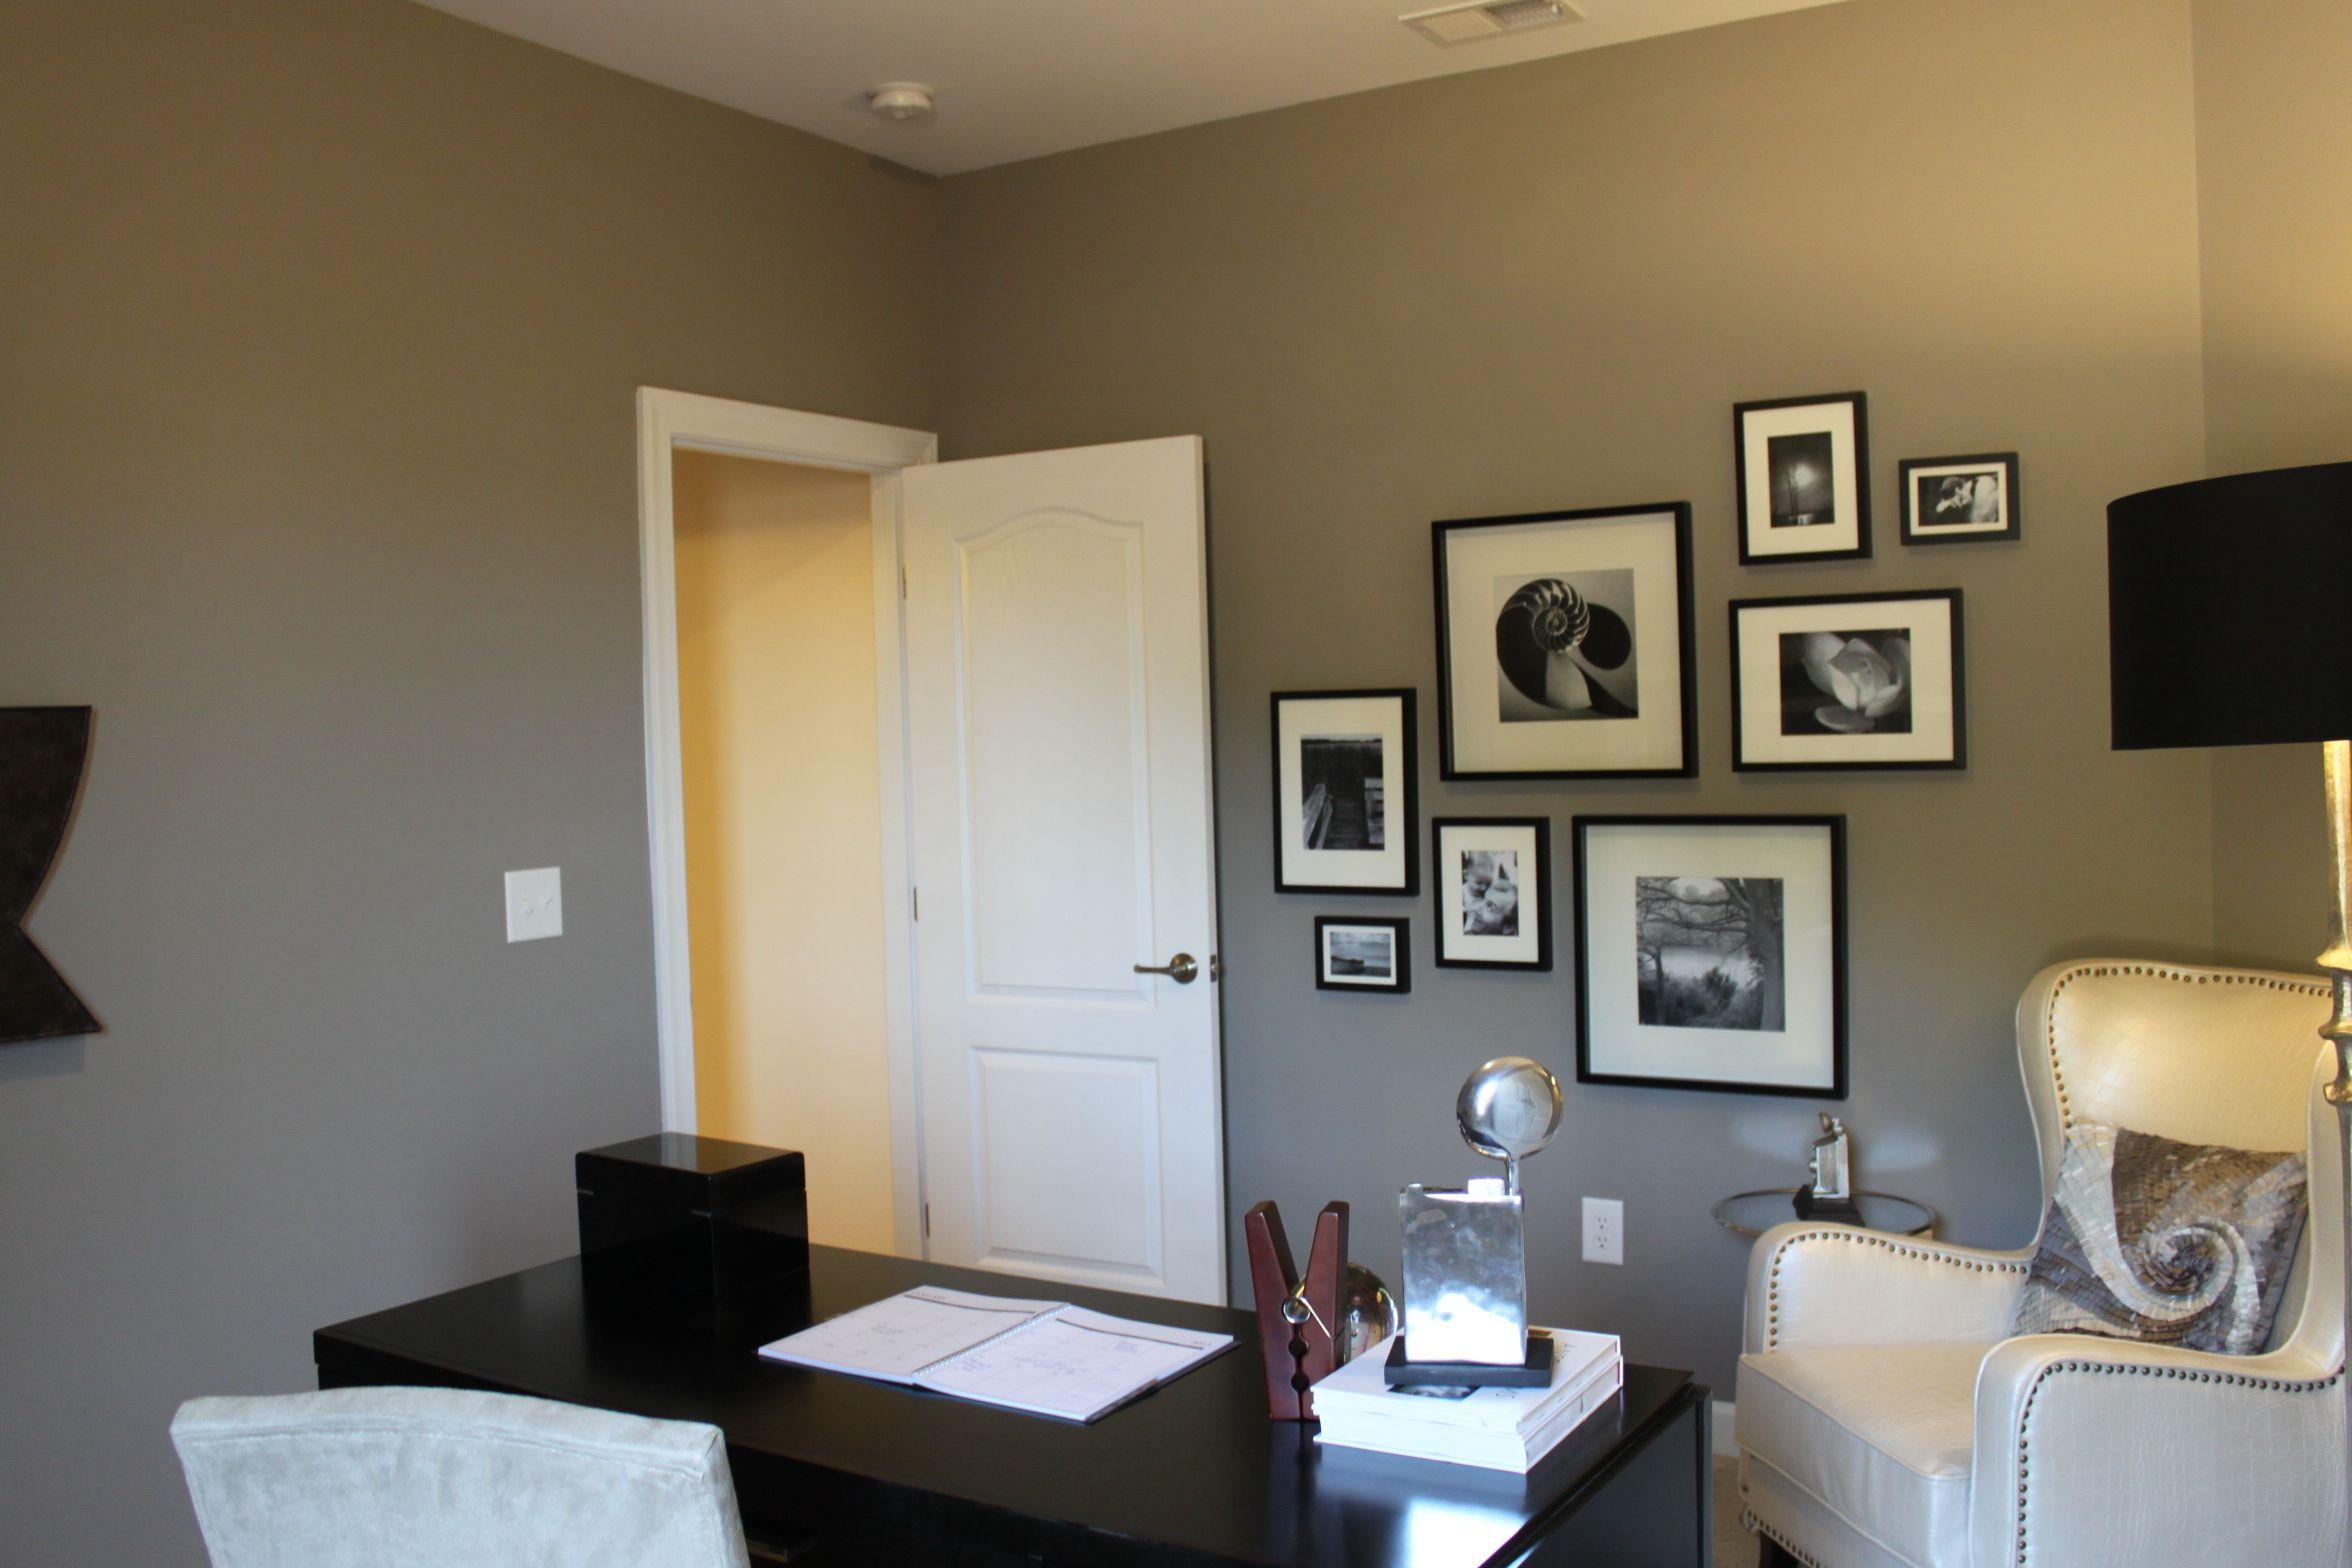 Inviting Guest Bedroom Room Size Is X Magnolia Model - 14 x 11 bedroom design